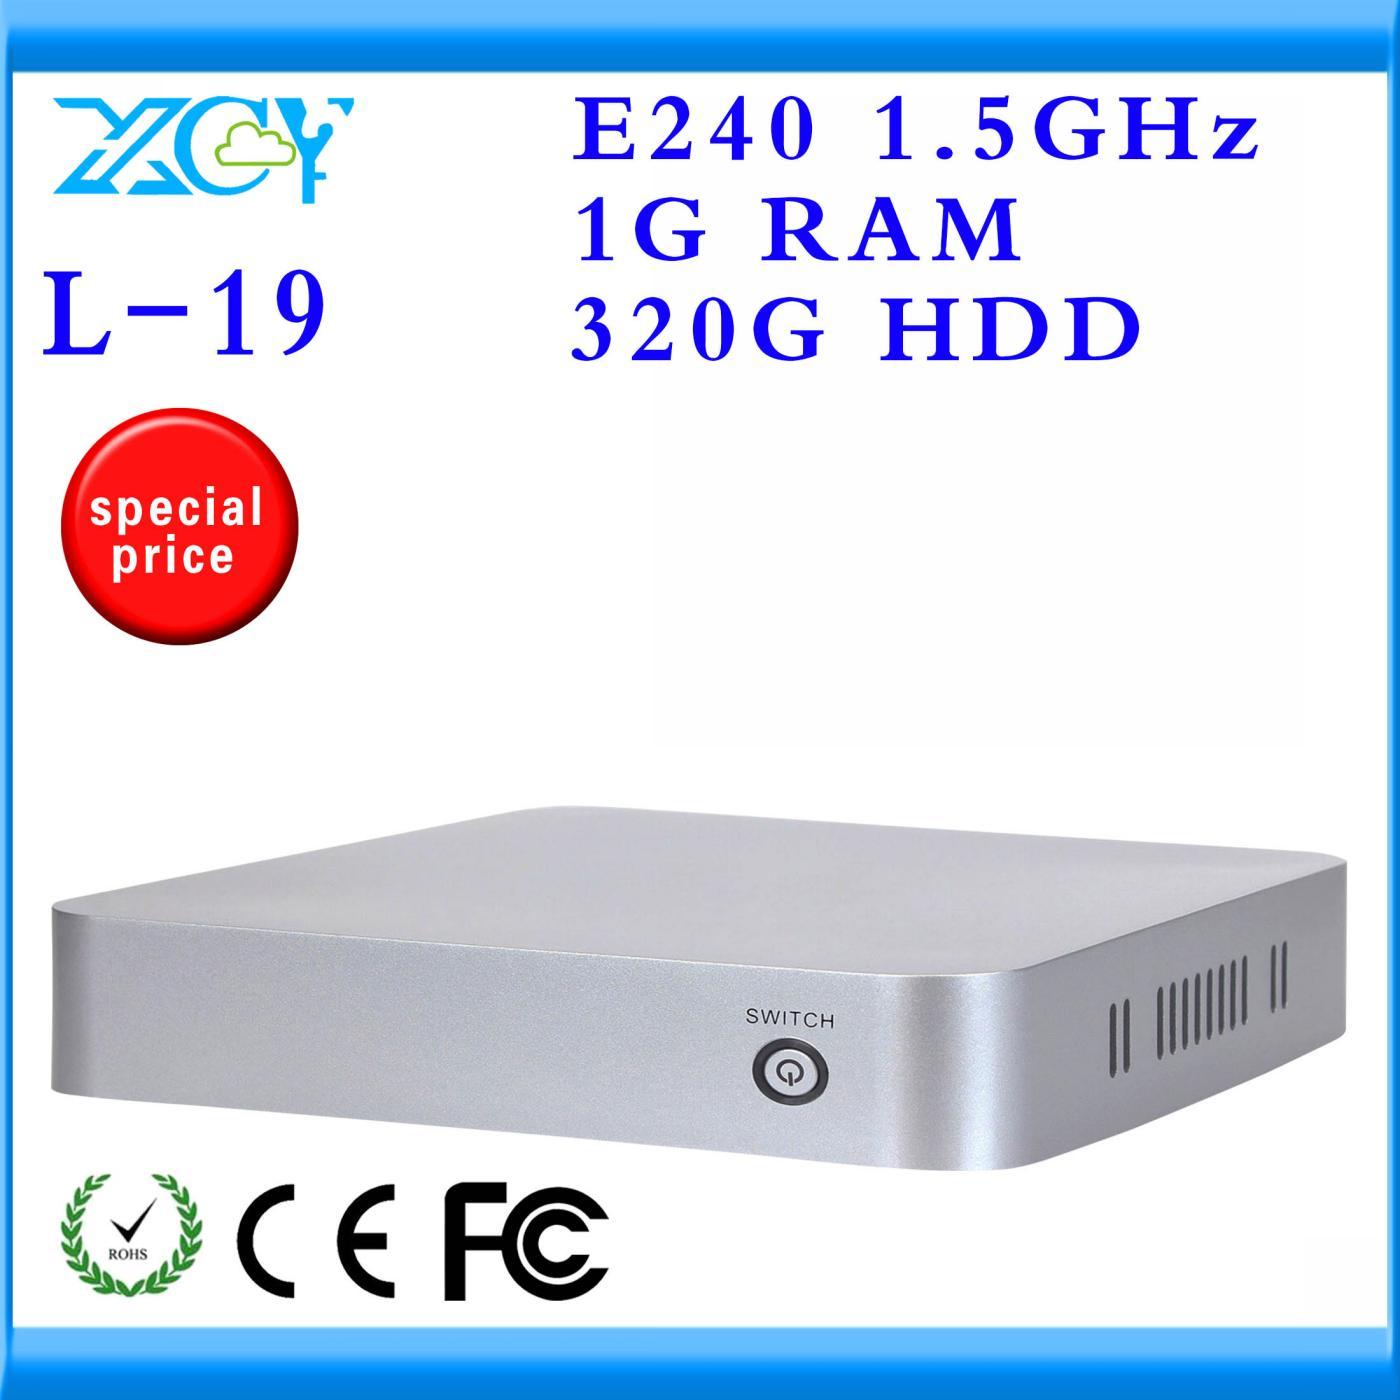 XCY Brand htpc computer mini pc x86 hdmi mini pc AMD E240 single core 1.5GHZ 320G HDD with HDMI/VGA Support wifi hd movie PC(China (Mainland))